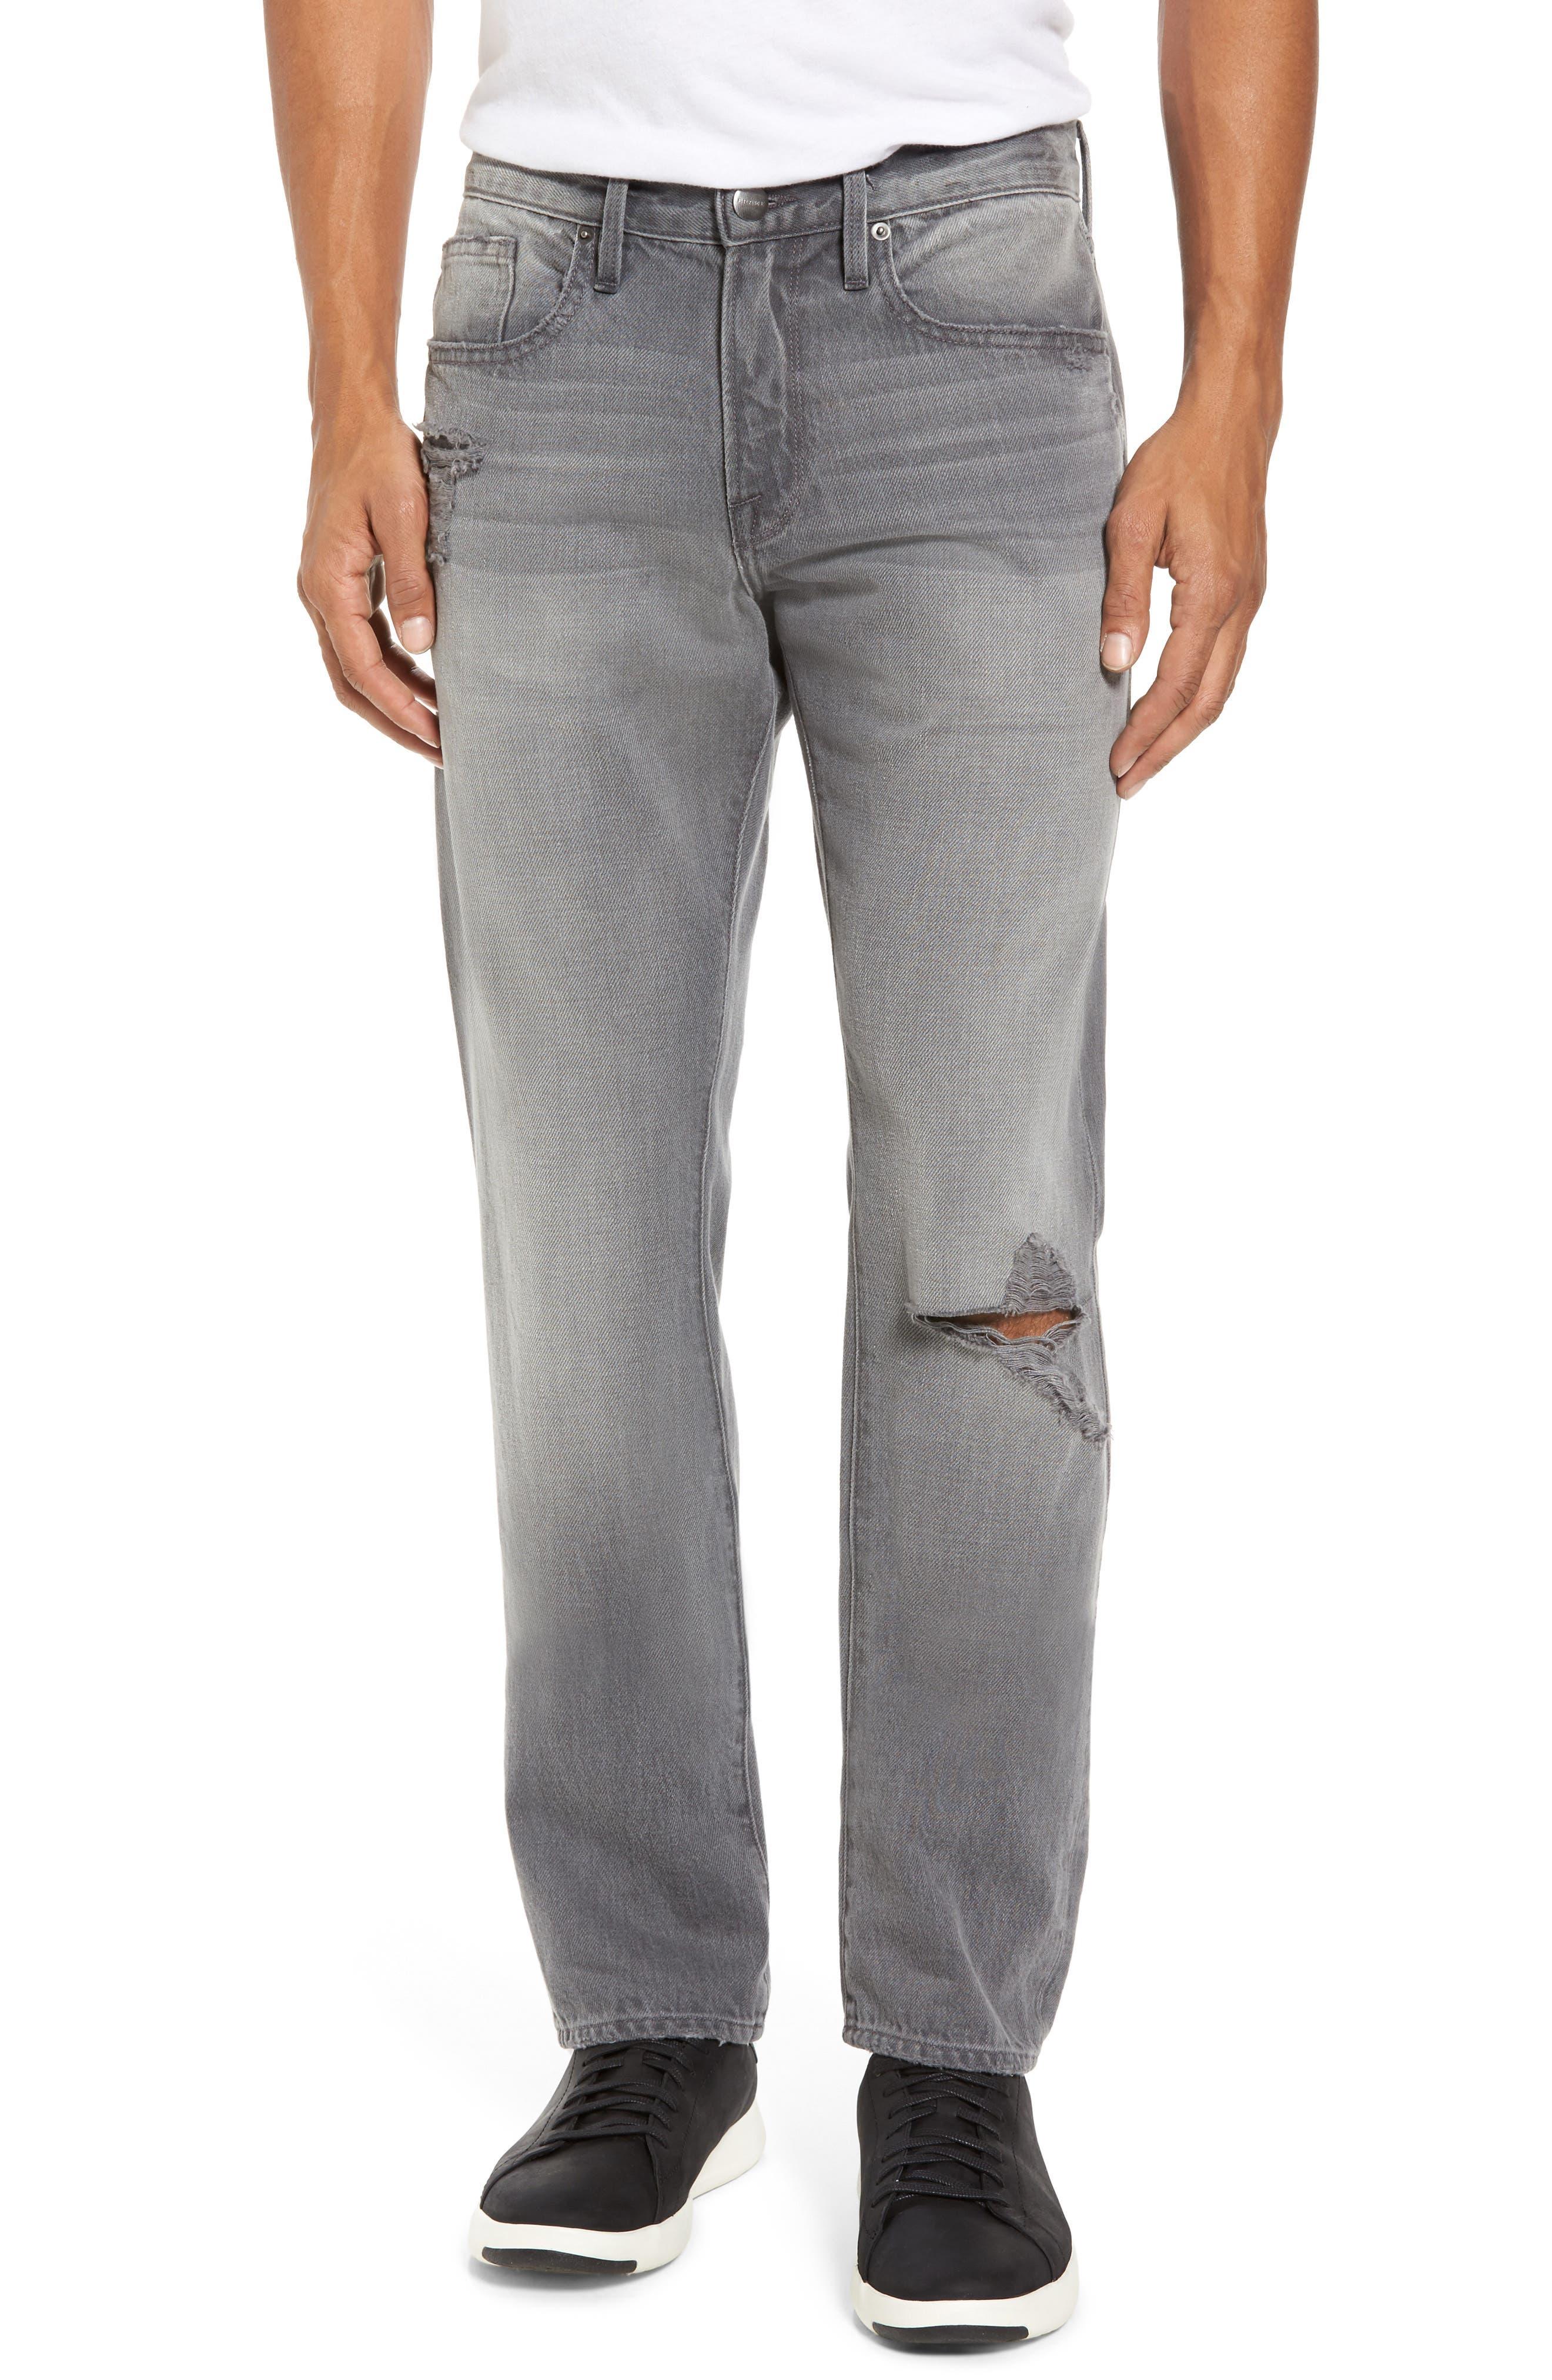 Alternate Image 1 Selected - FRAME L'Homme Slim Fit Jeans (Grey Fox)